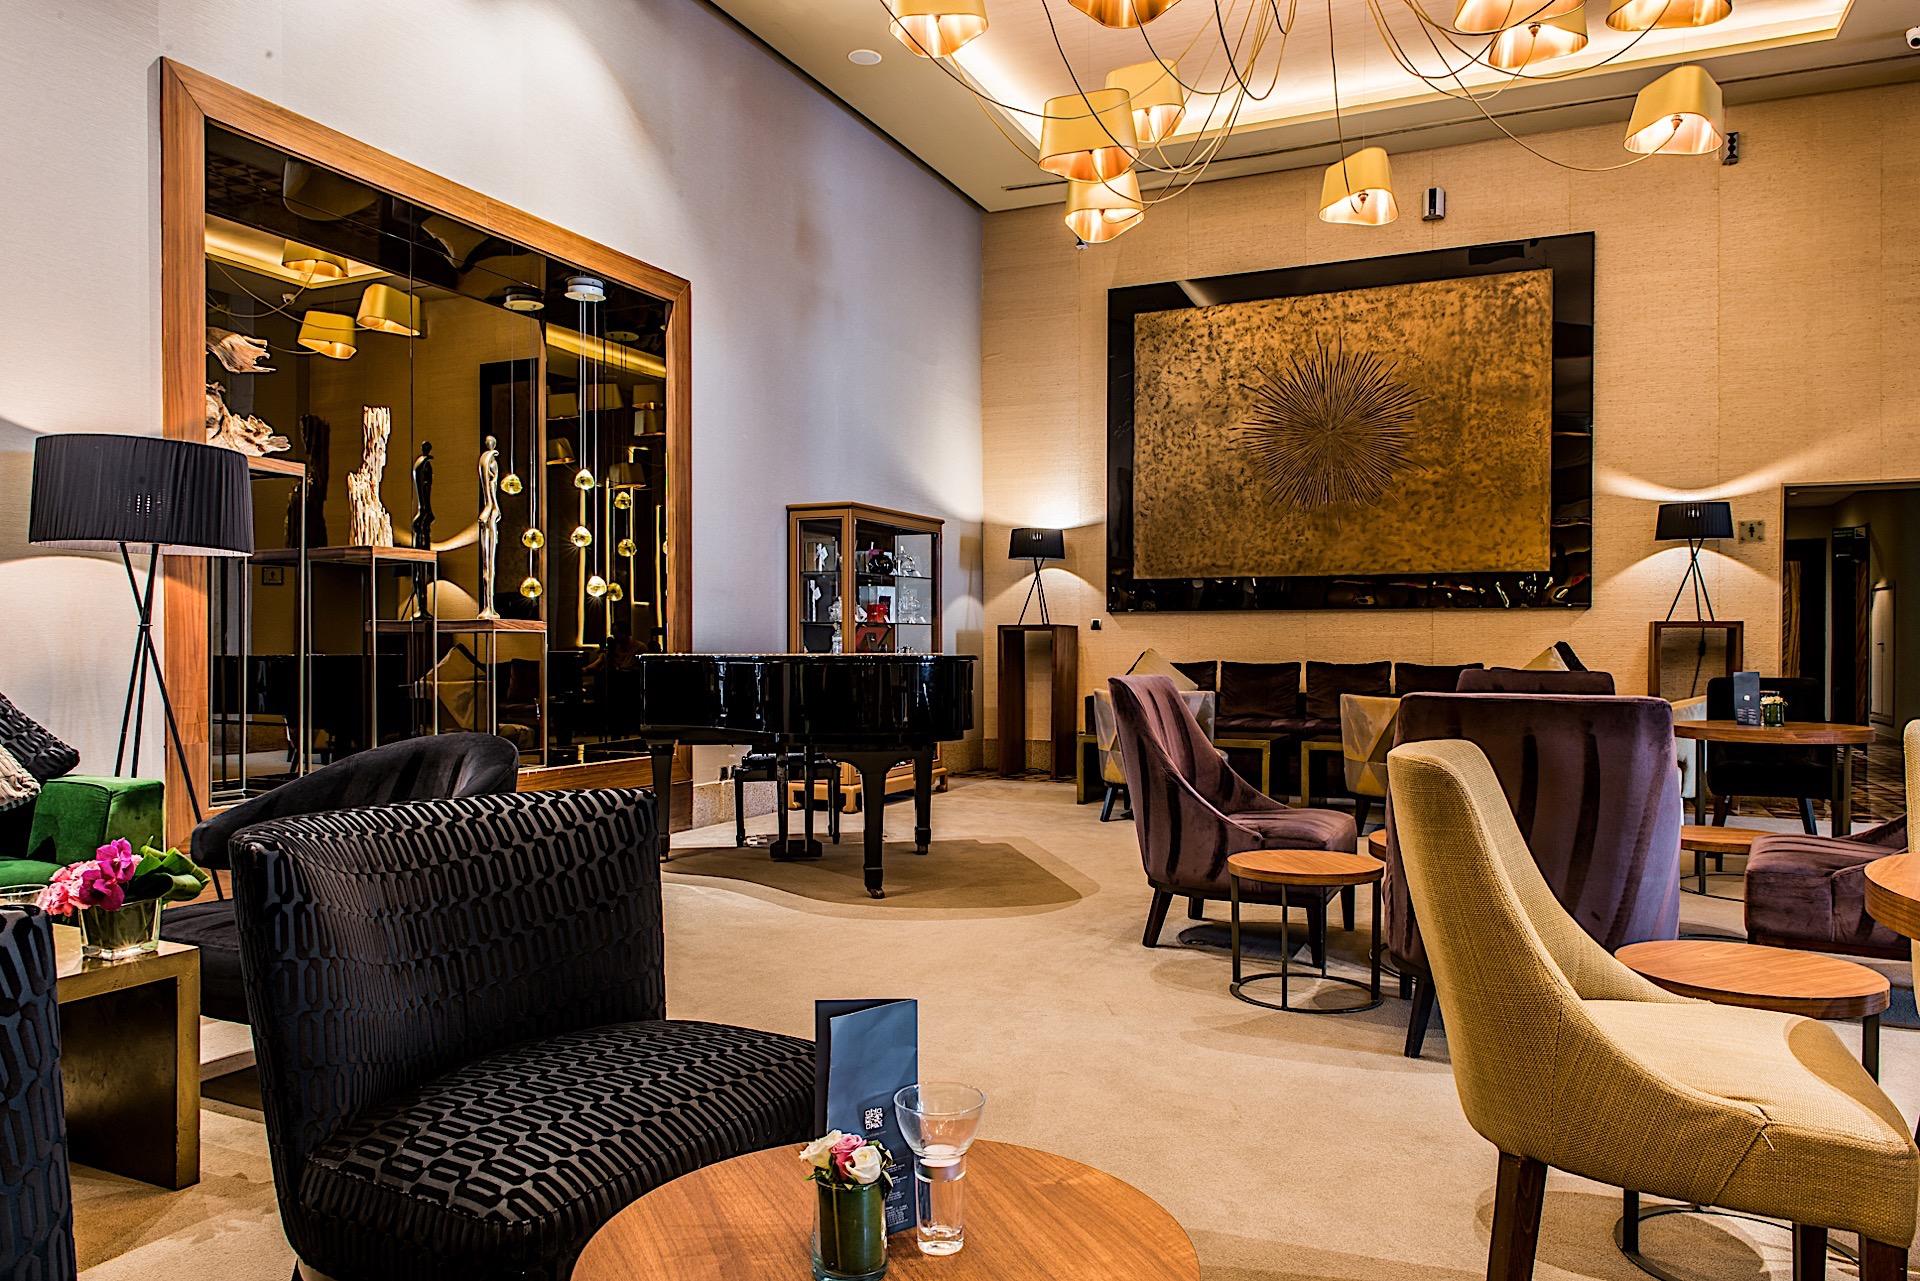 Lobby Bar at Kenzi Tower Hotel in central Casablanca, Morocco